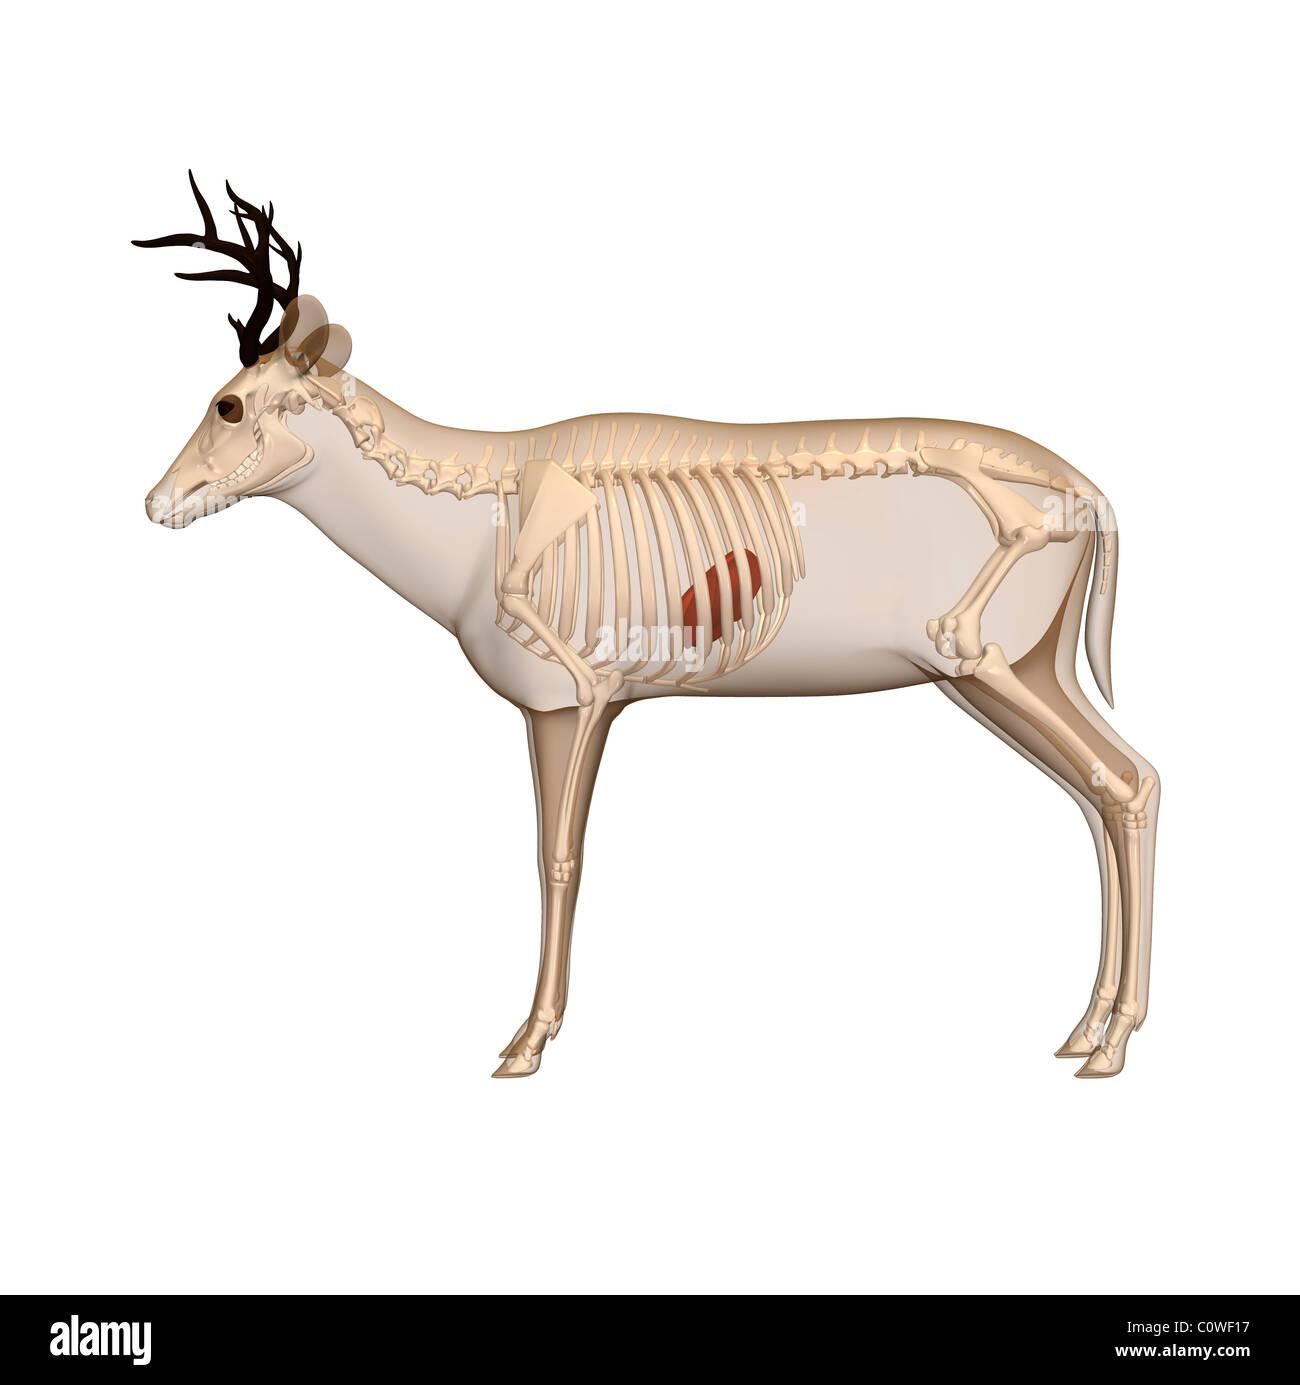 deer anatomy liver skeleton transparent body Stock Photo: 34981331 ...